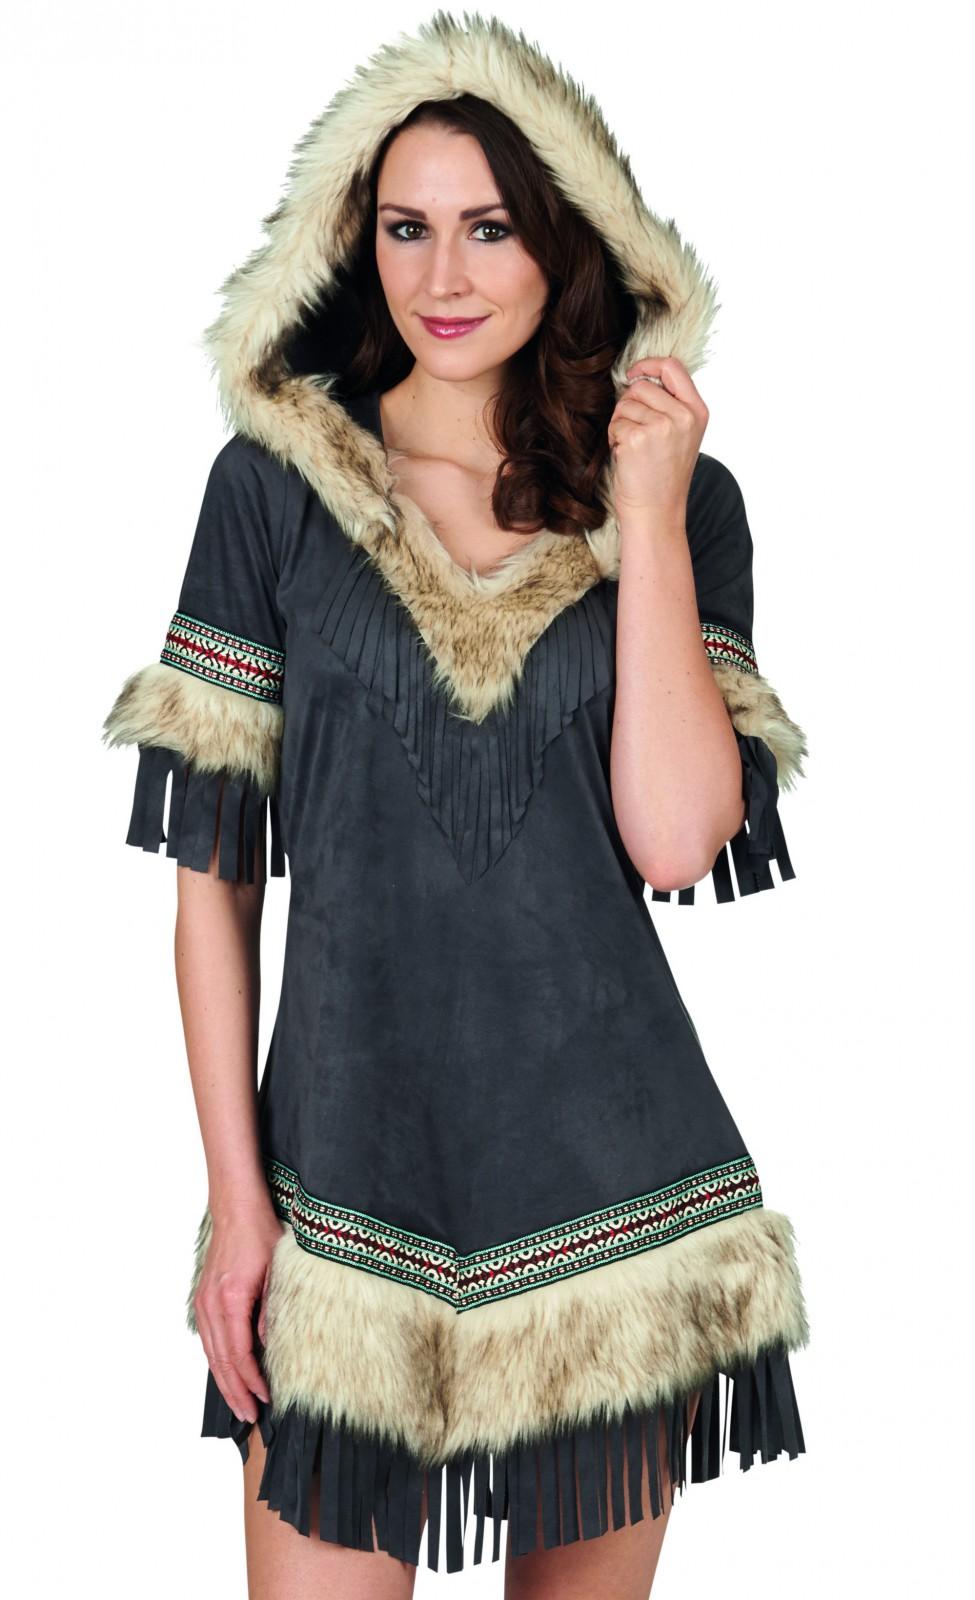 exclusives kost m kleid mit kapuze u fellbesatz eskimo indianerin wildlederoptik kost me co. Black Bedroom Furniture Sets. Home Design Ideas